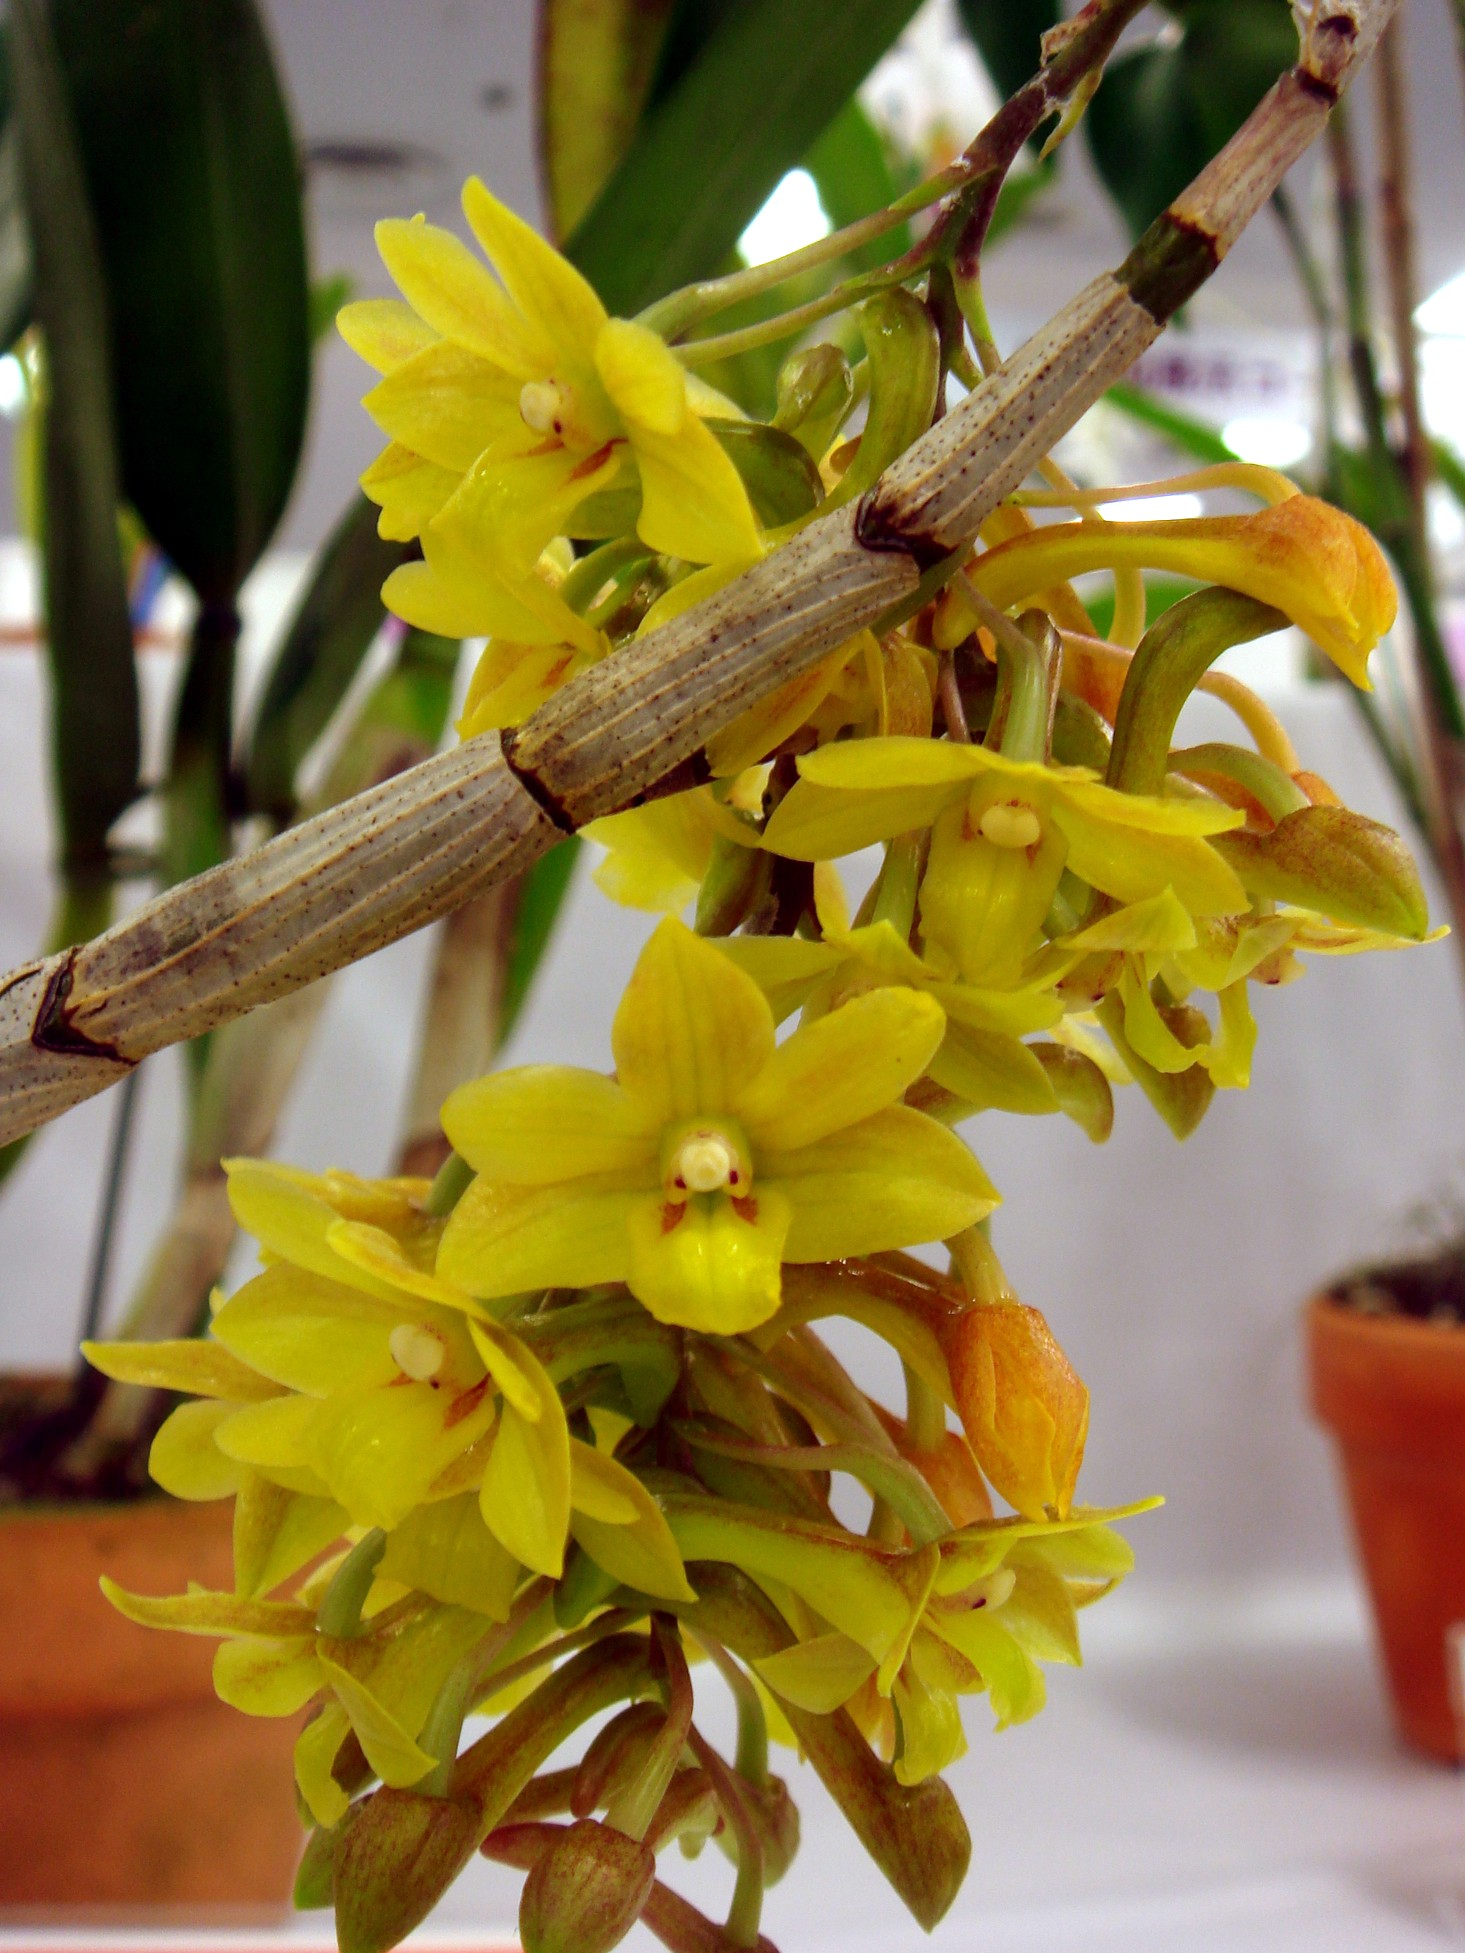 http://orchids.la.coocan.jp/Dendrobium/Dendrobium%20guerreroi/DSC07202.JPG